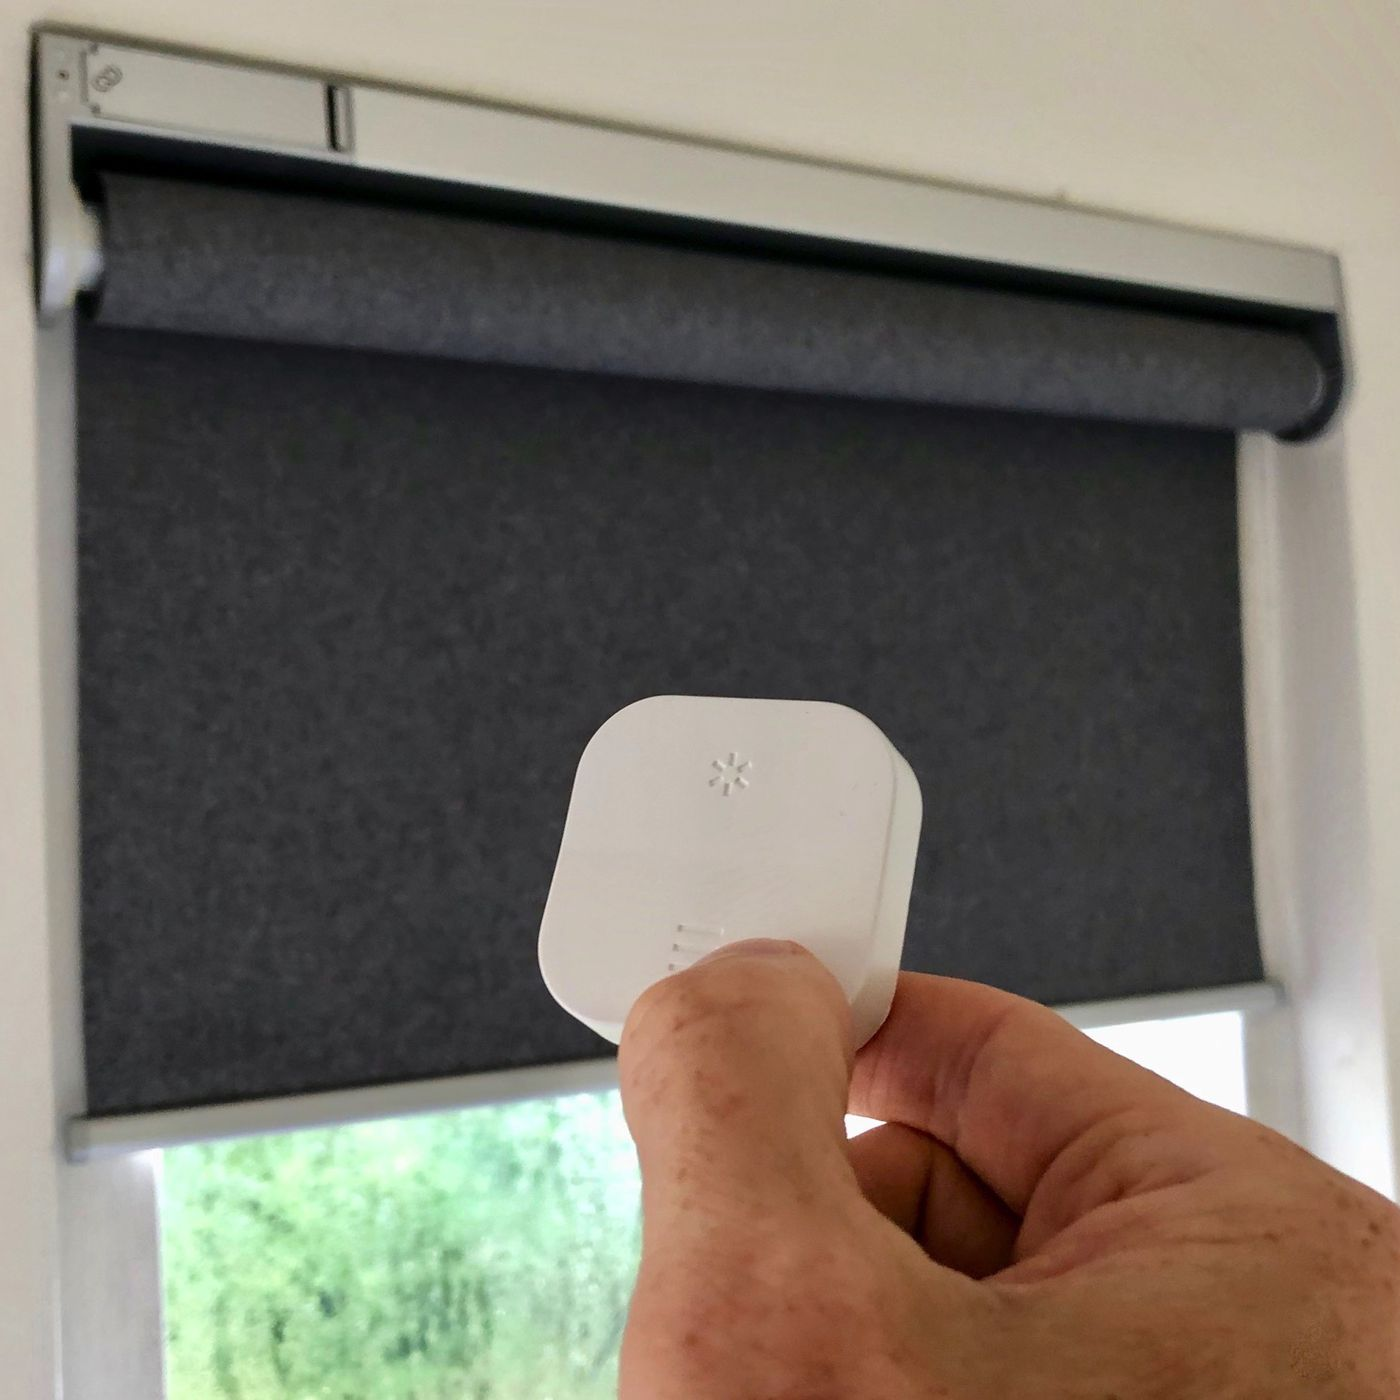 Ikea Fyrtur Smart Blinds Review Worth